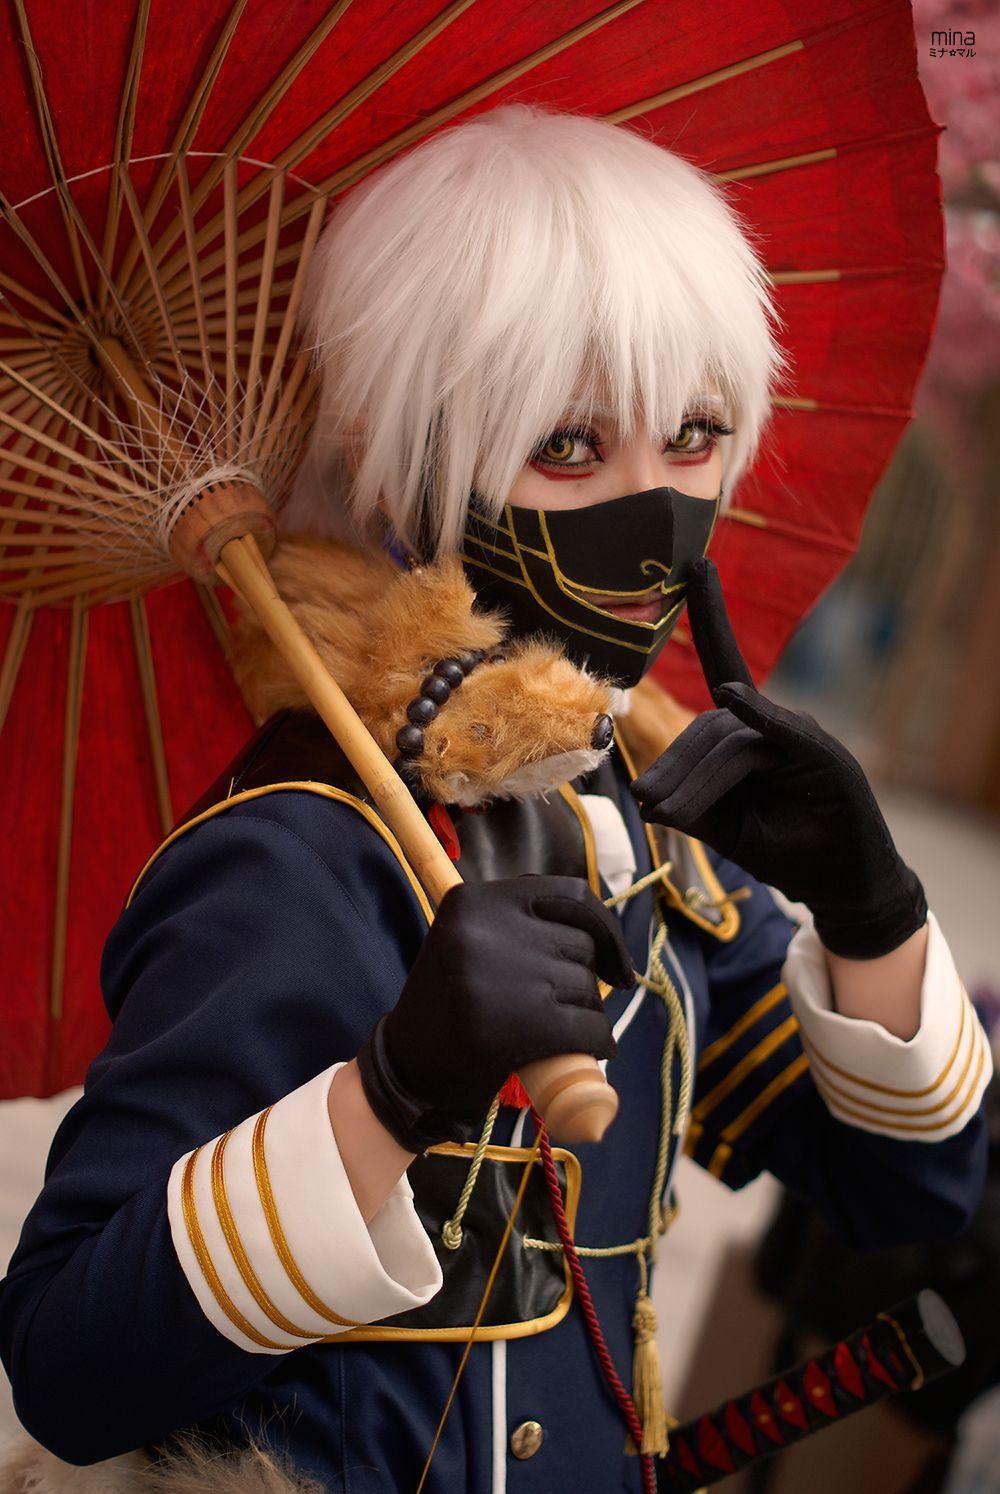 Nakigitsune - Mina Maru(Mina) Nakigitsune Cosplay Photo - Cure WorldCosplay